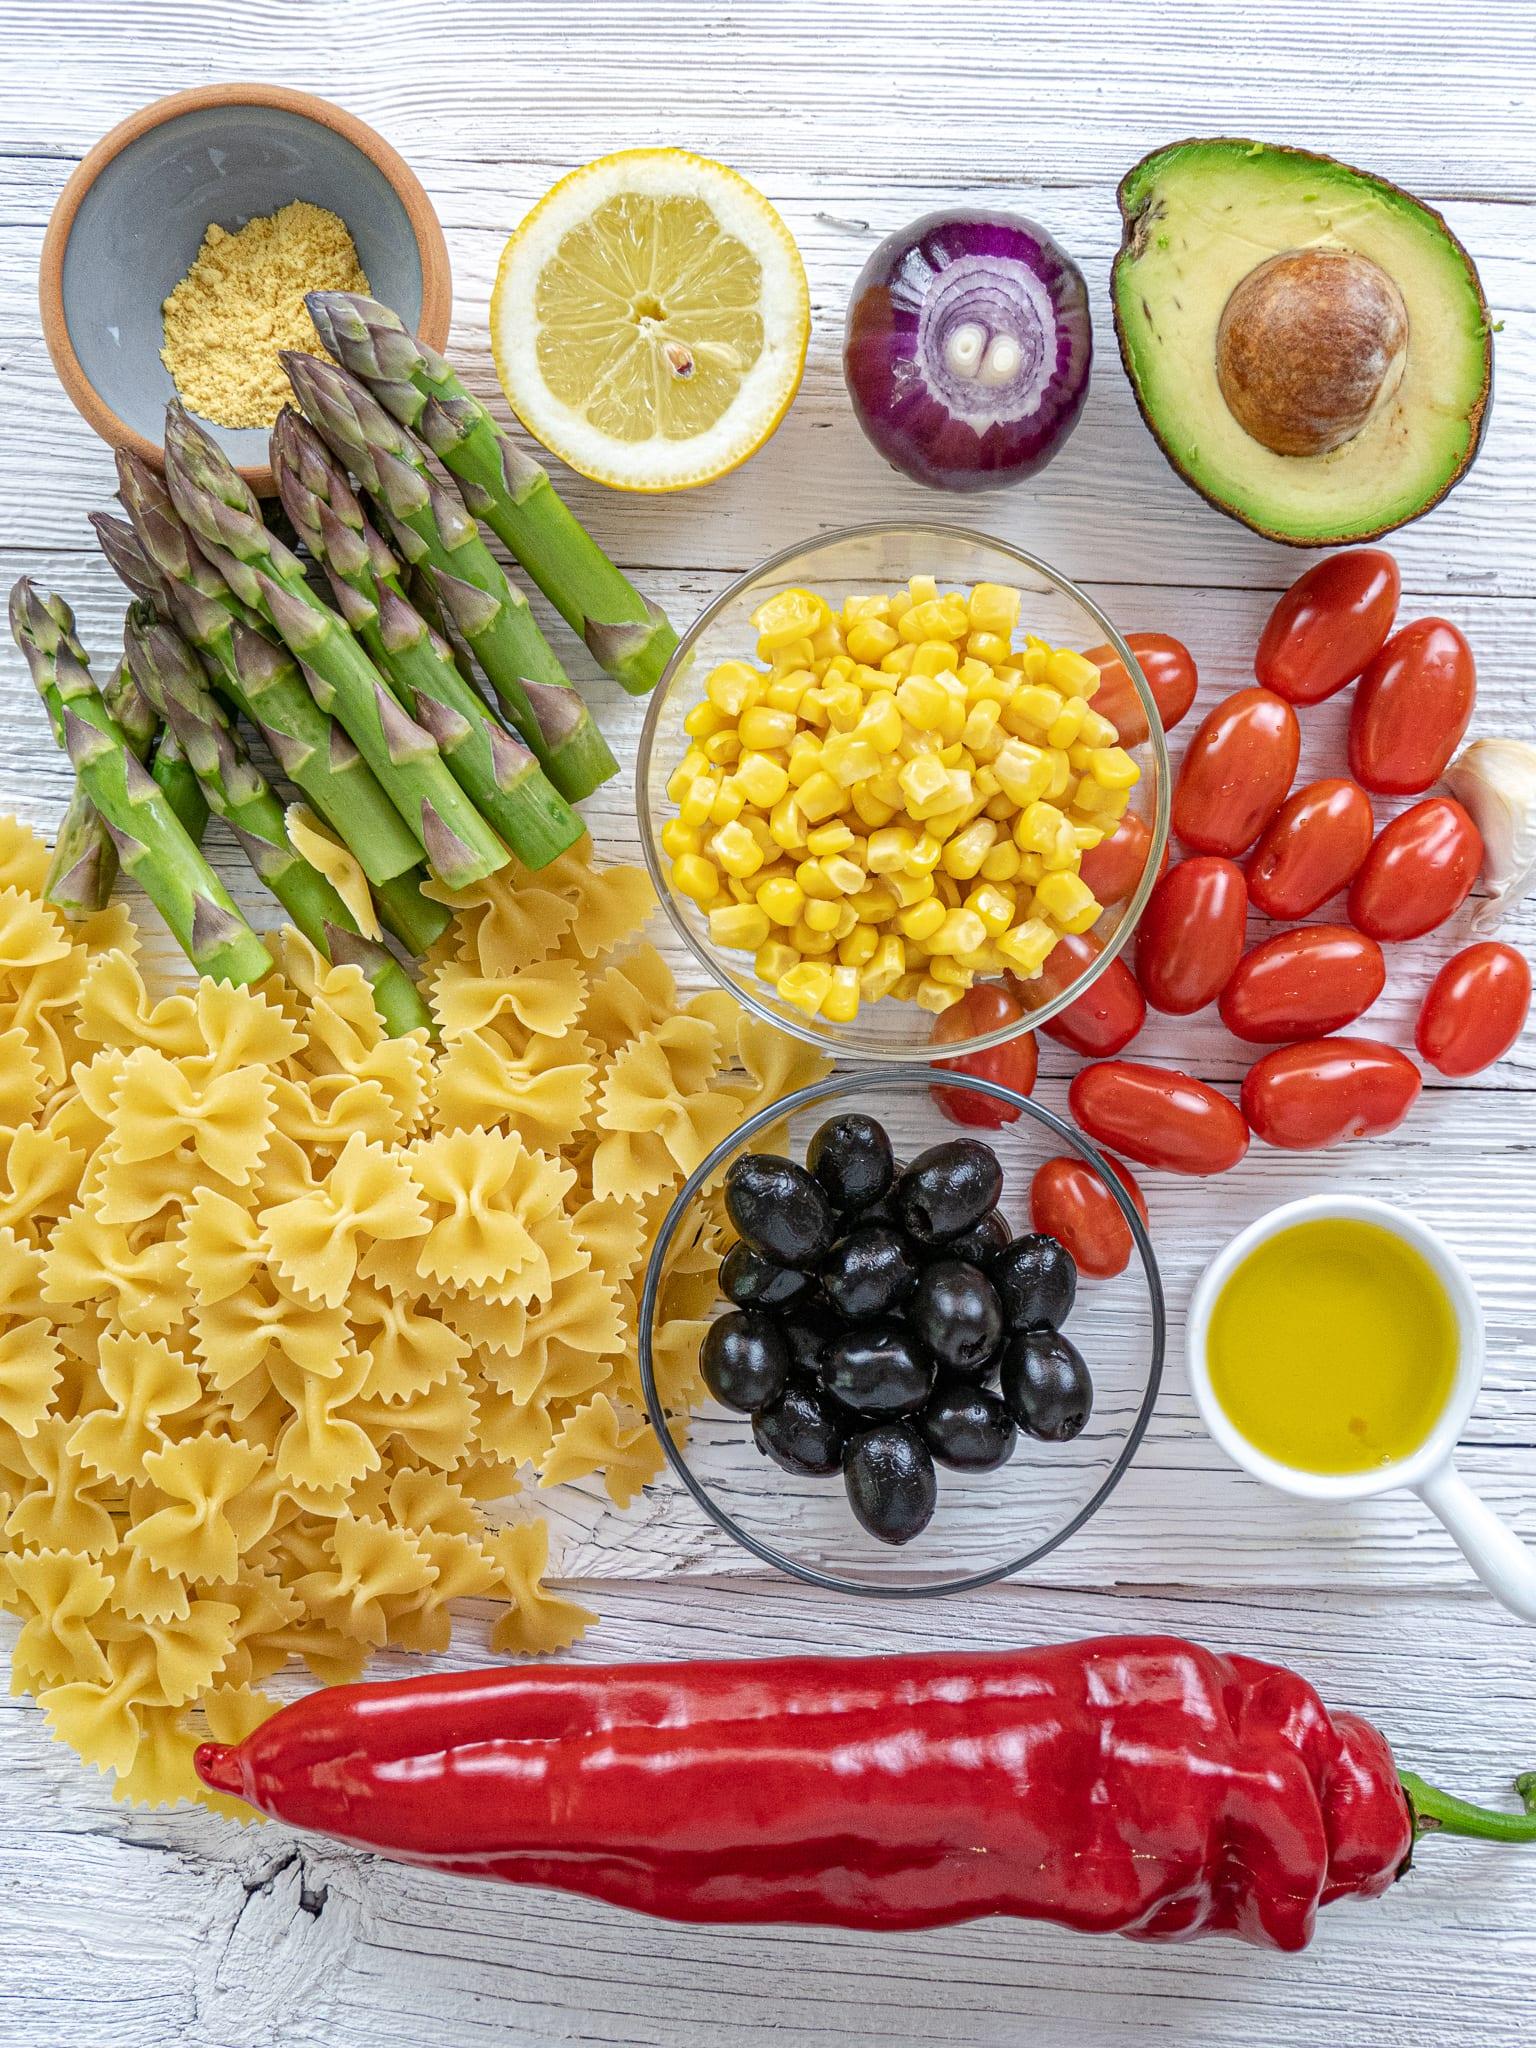 Ingredienti per l'insalata di pasta